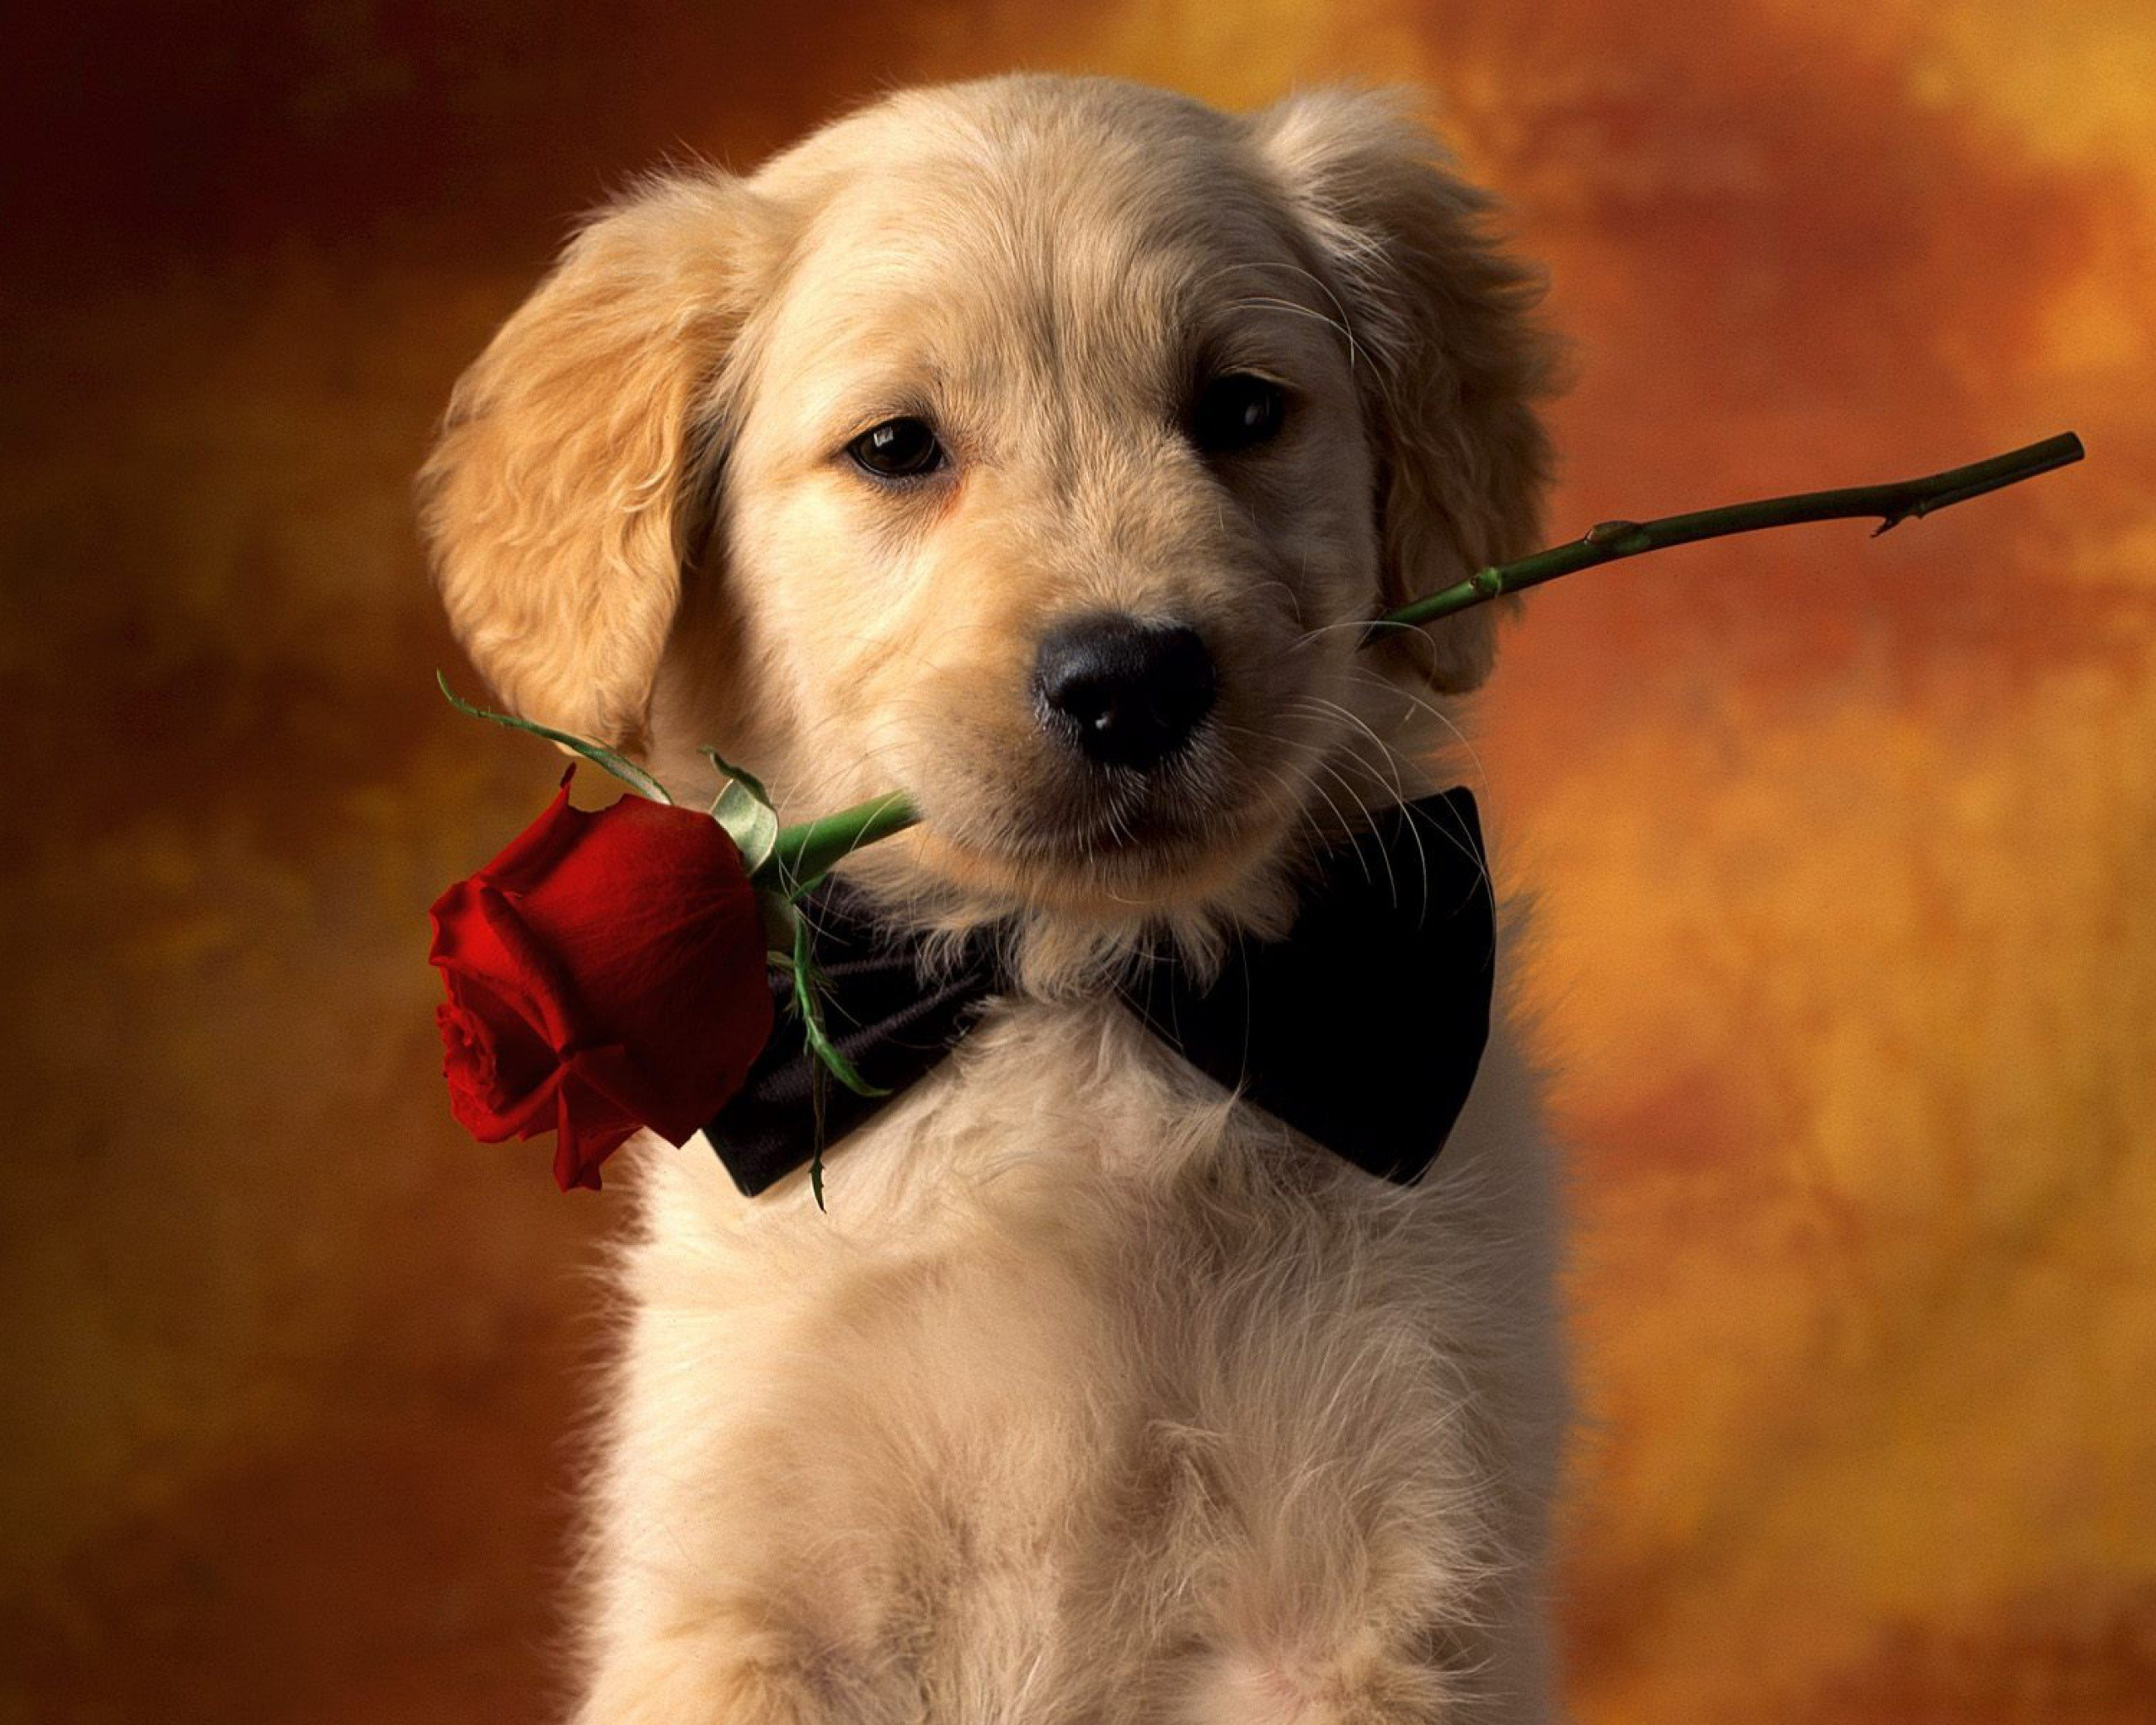 Cute Dog Golden Retriever Pet Puppy Red Rose Rose 2560x2048